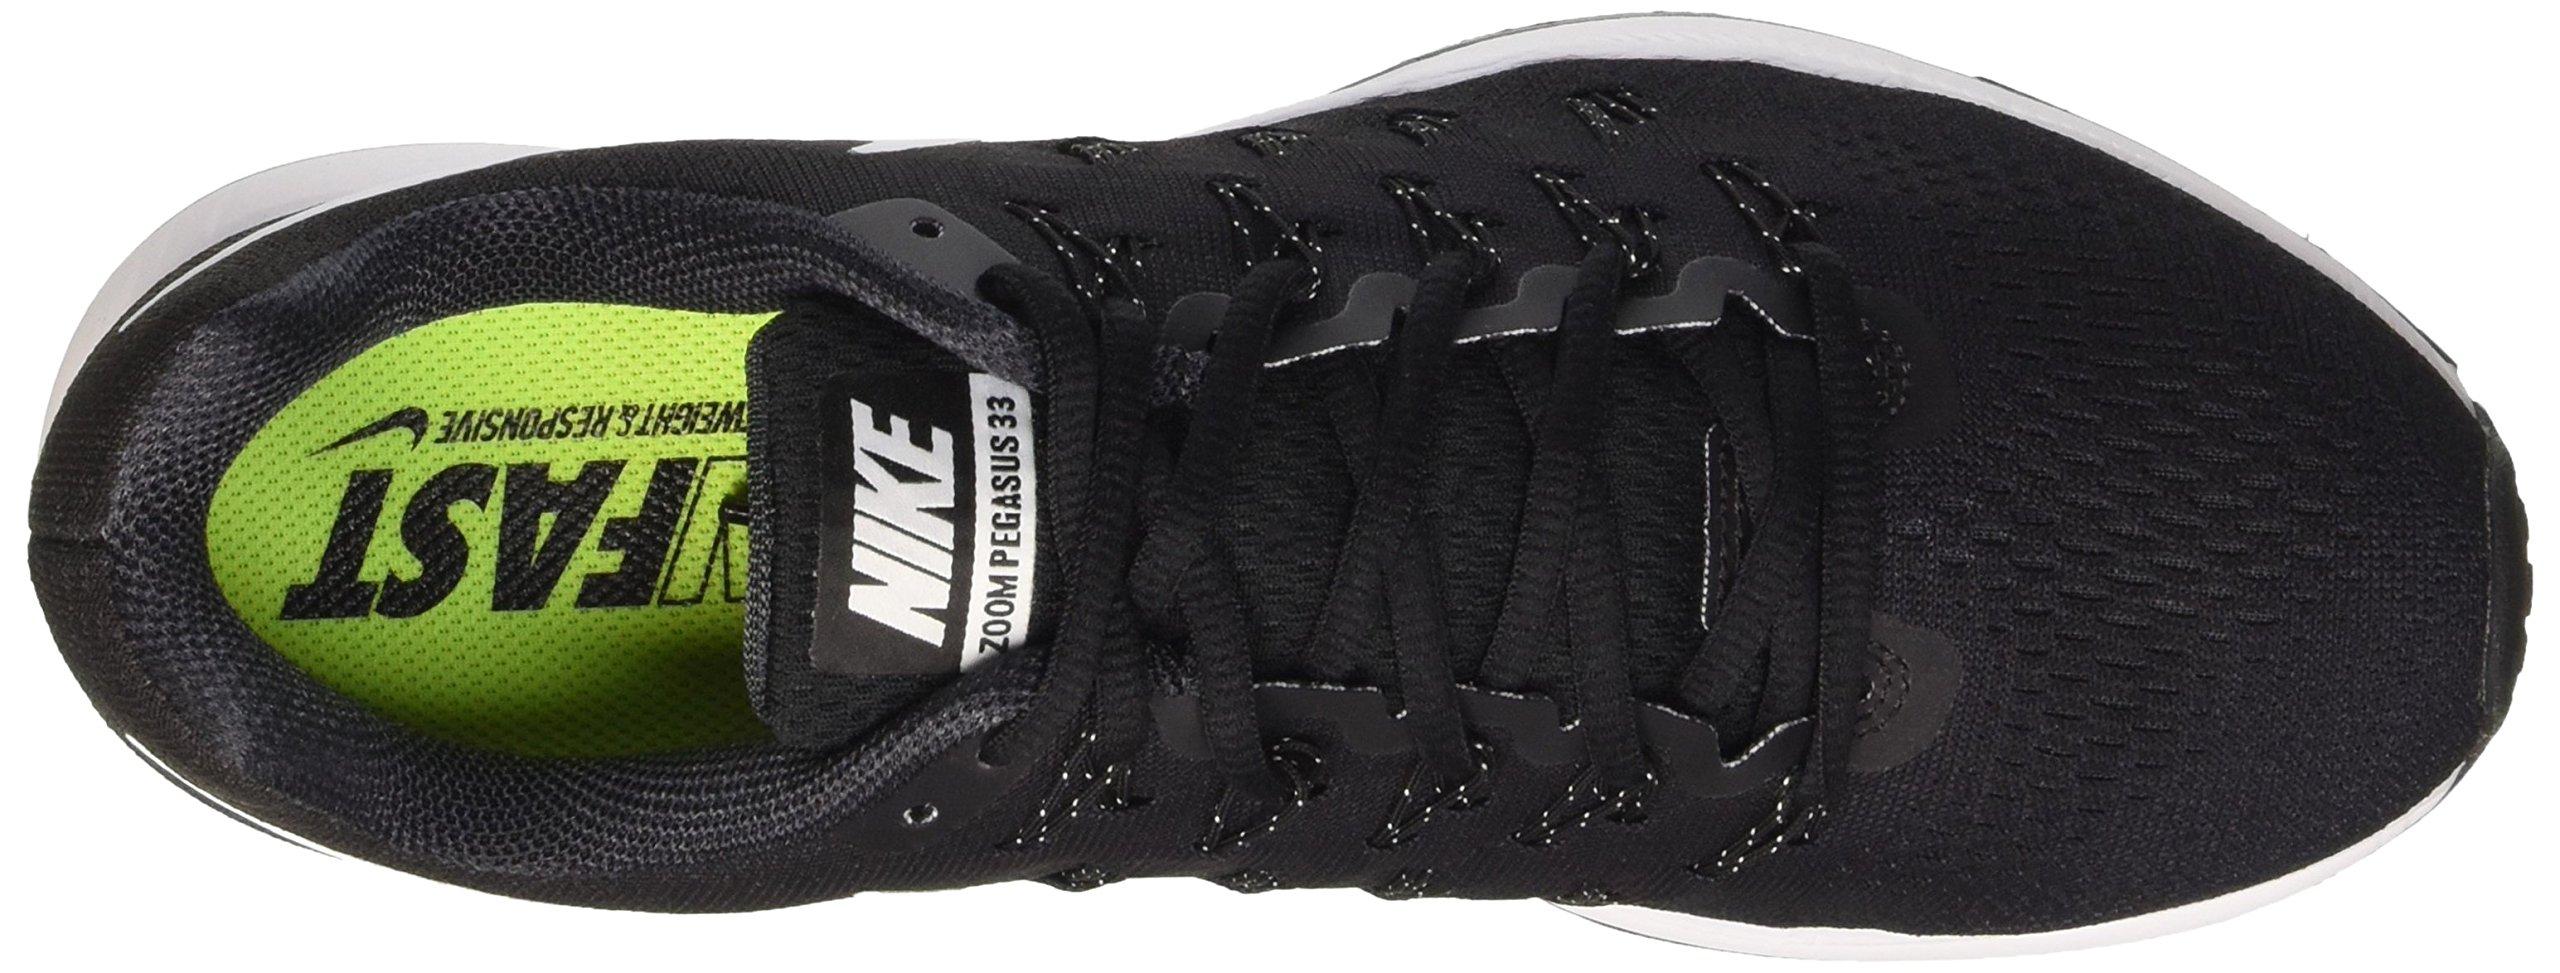 Nike Men's Air Zoom Pegasus 33, Black/White/Anthracite/Cool Grey - 9.5 D(M) US